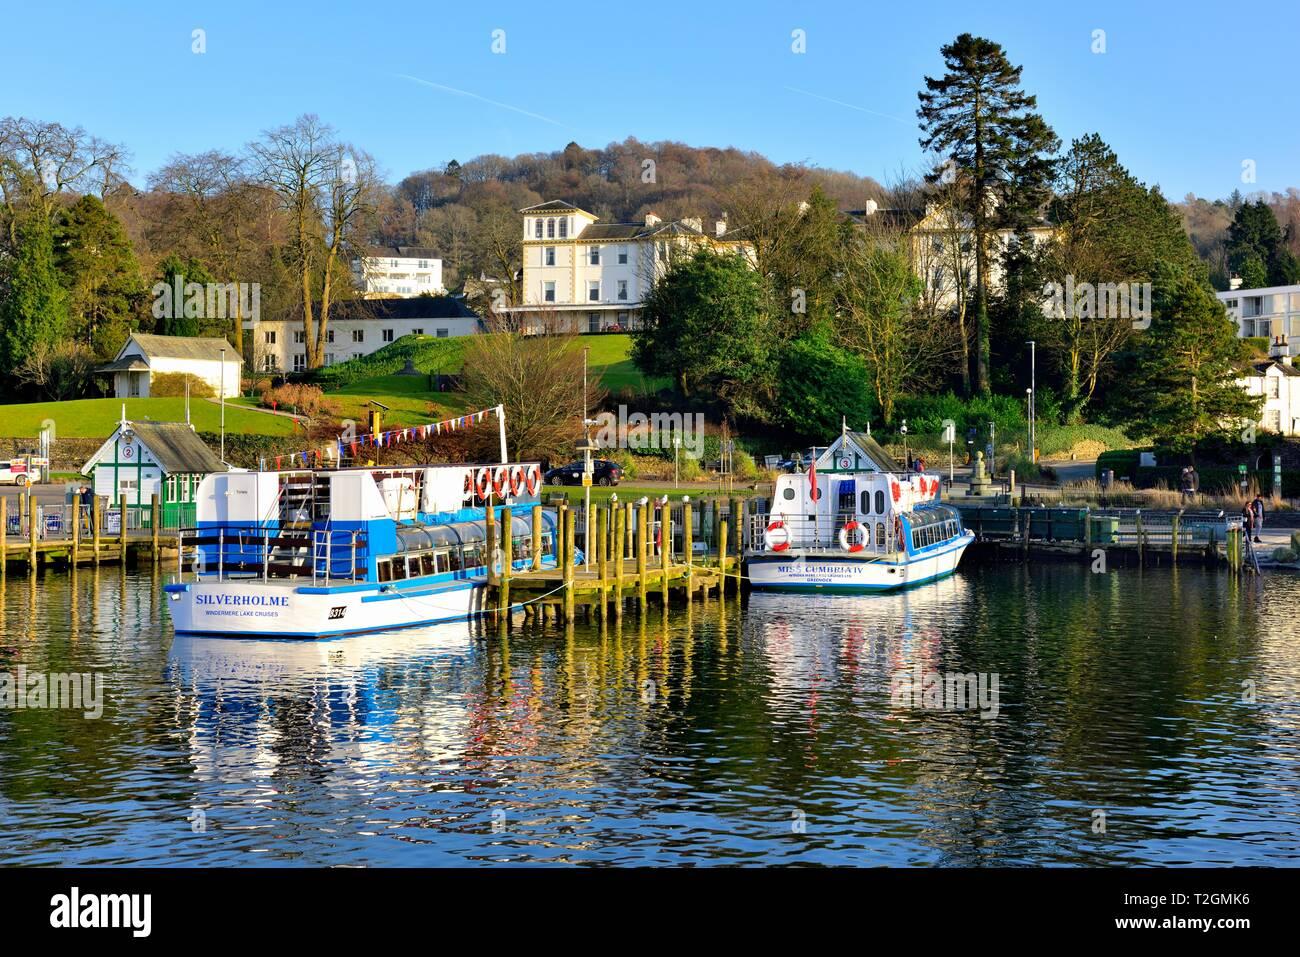 Bowness on Windermere,Lake Windrmere,Lake District,Cumbria,England,UK Stock Photo